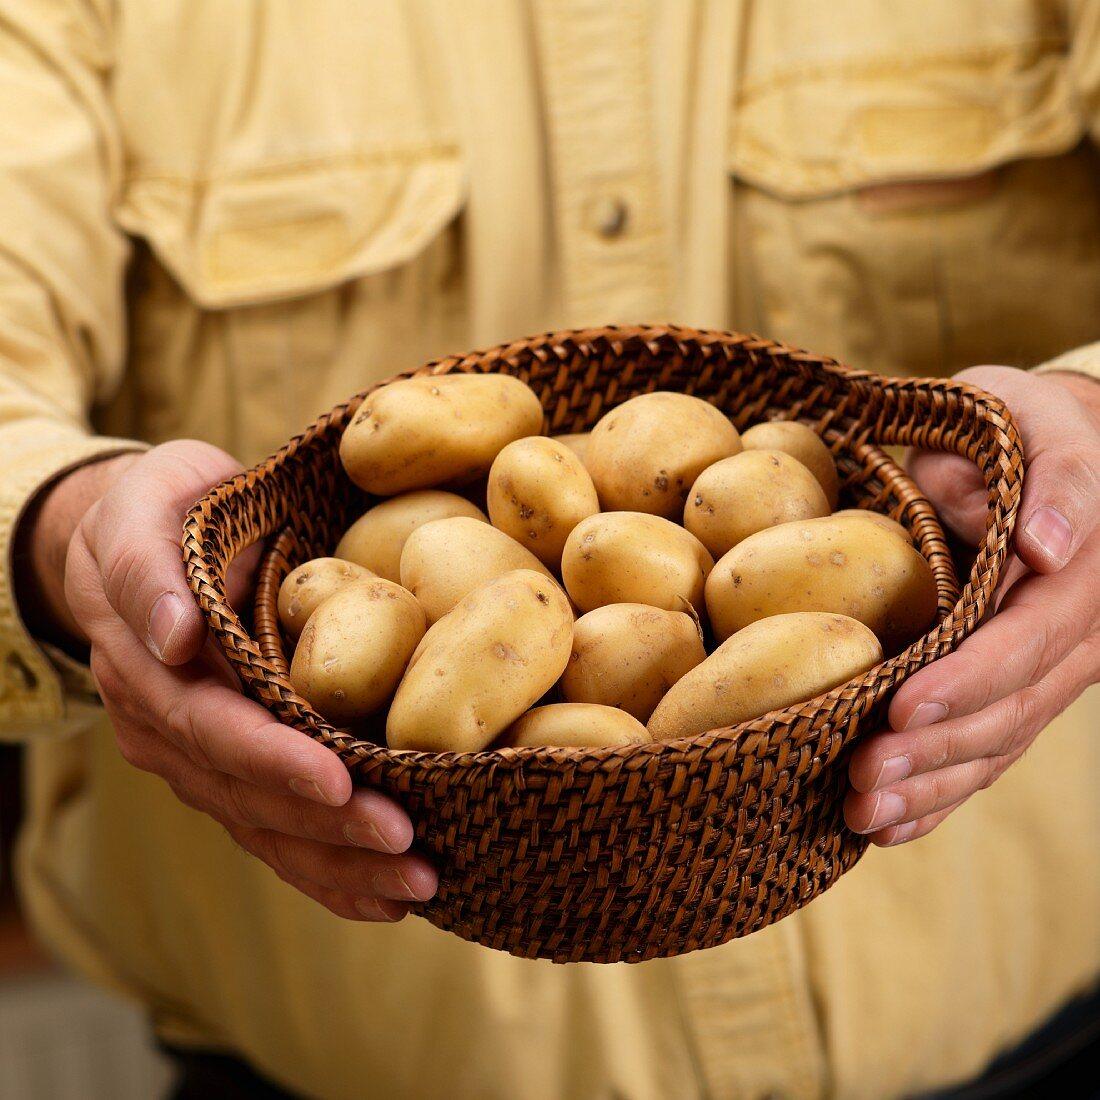 A man holding a basket of small Yukon Gold potatoes